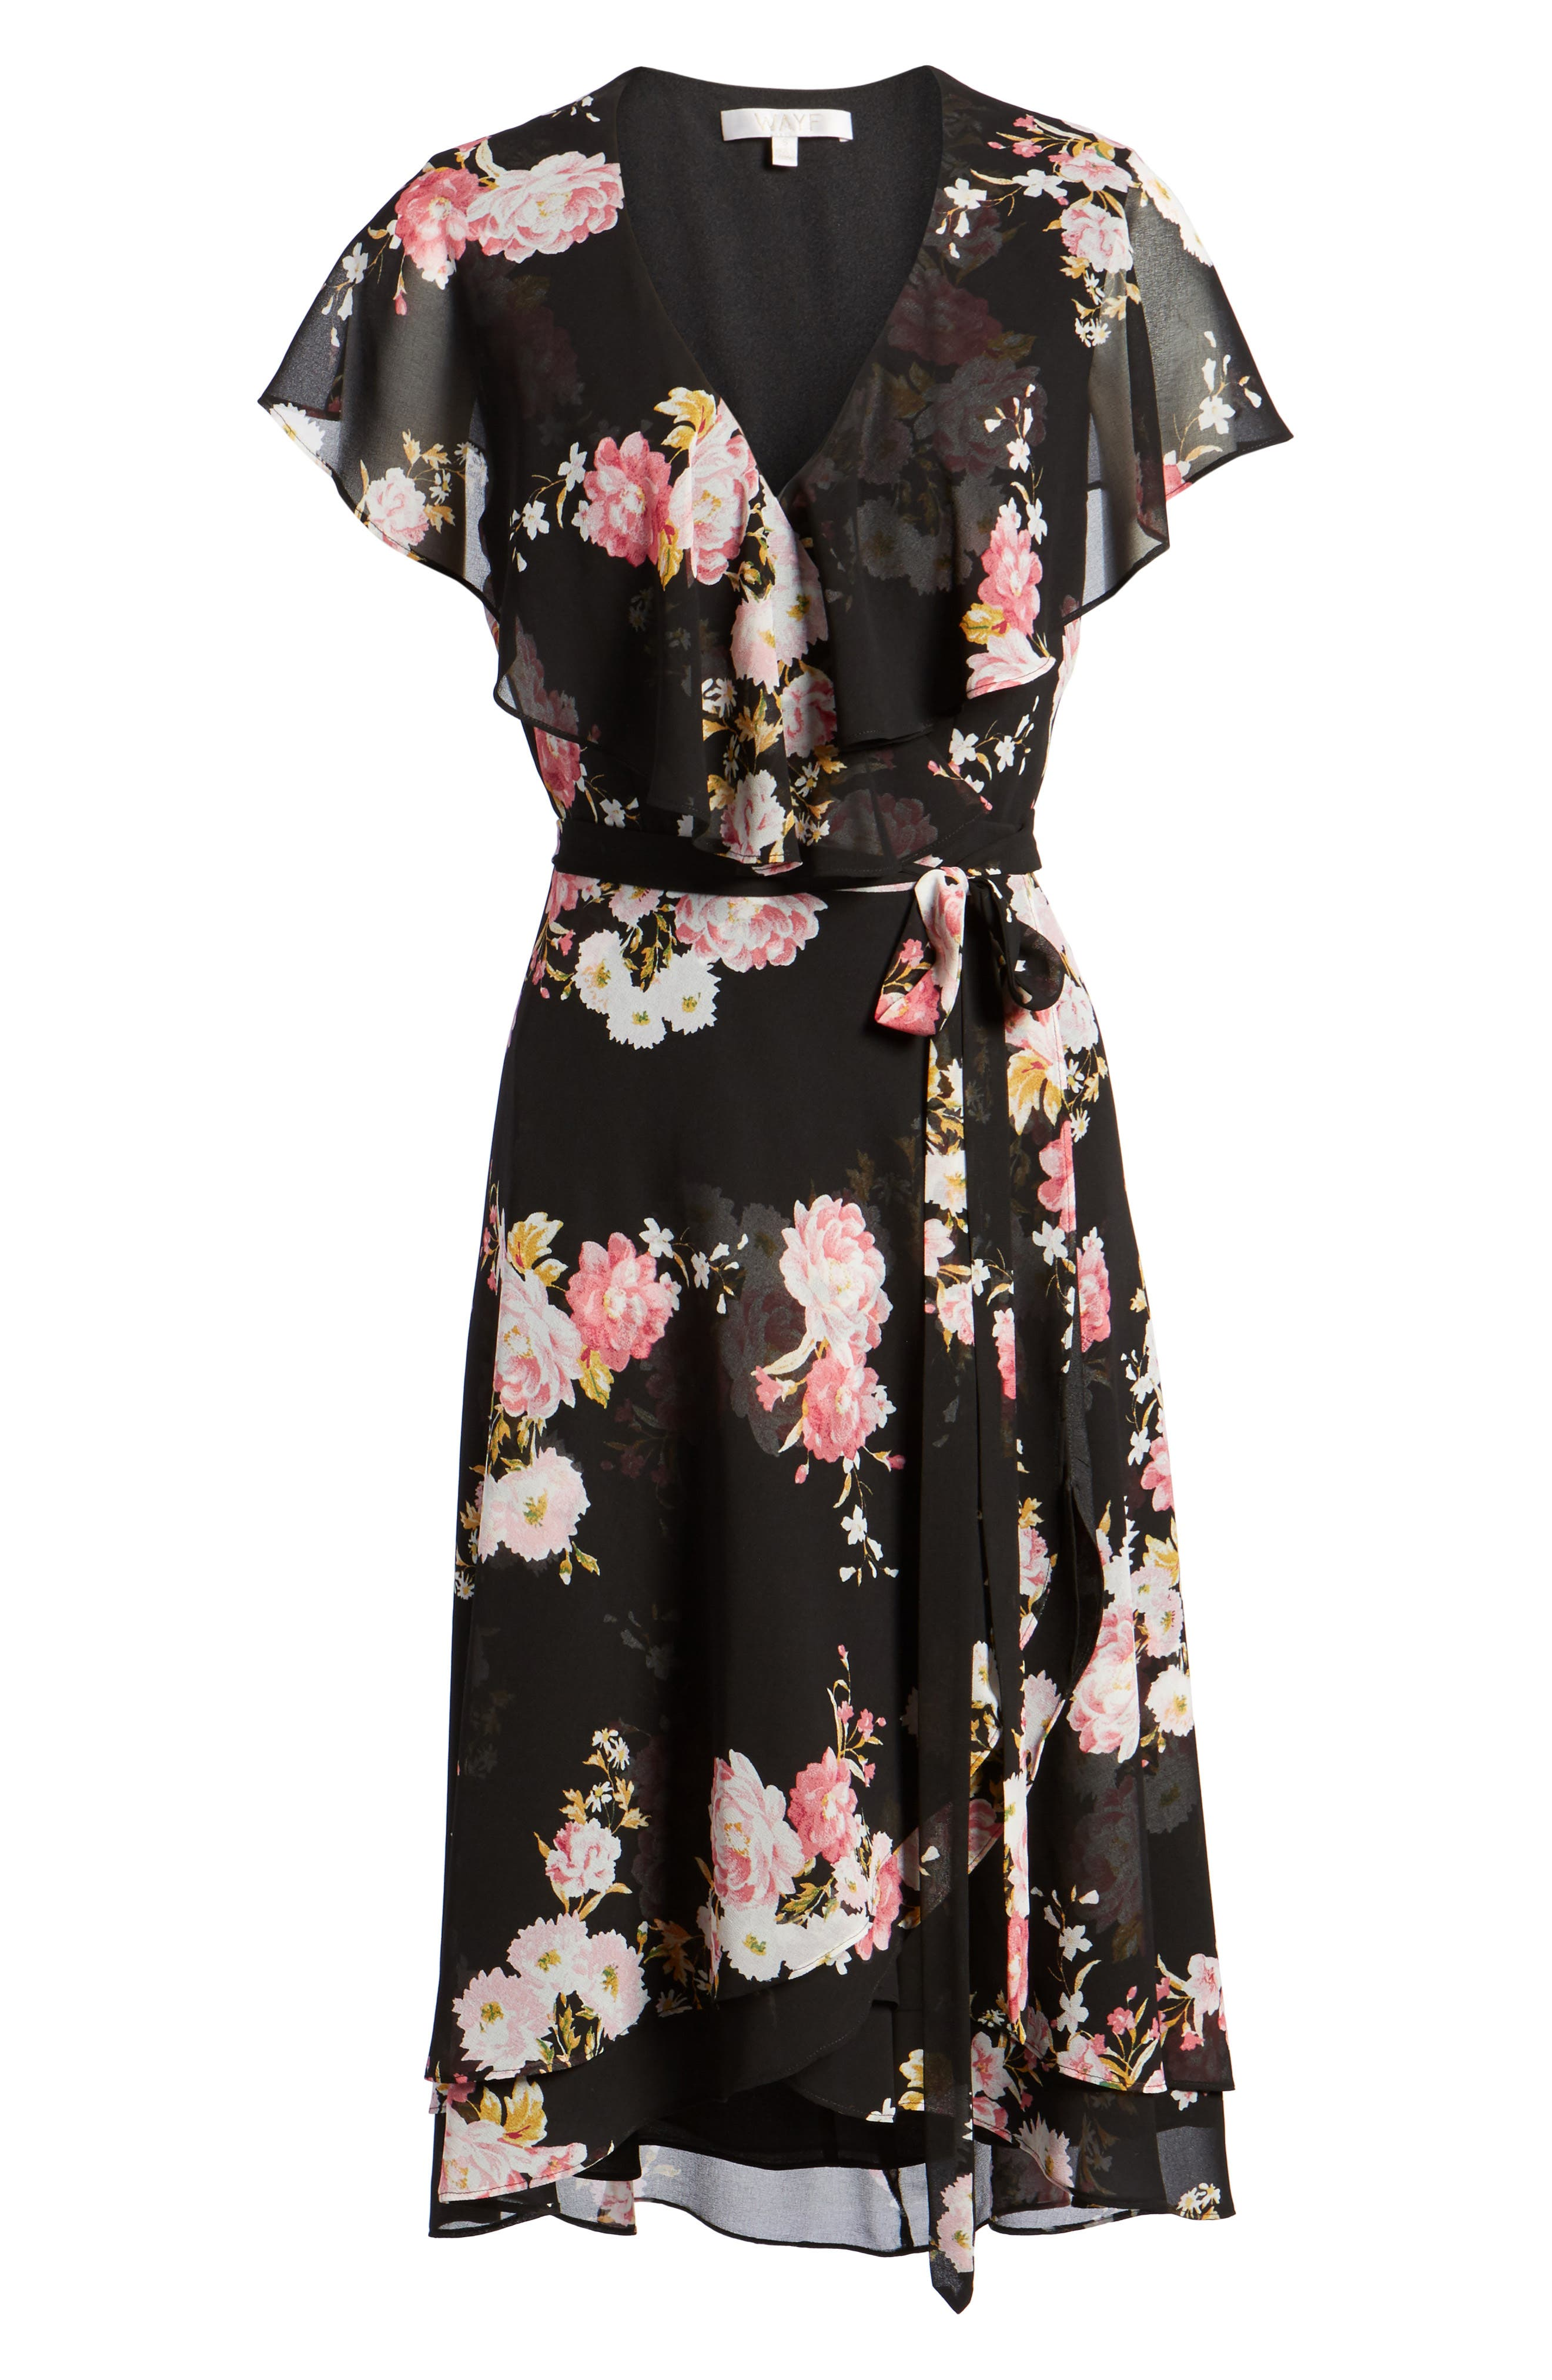 Polermo Wrap Midi Dress,                             Alternate thumbnail 6, color,                             Black Floral